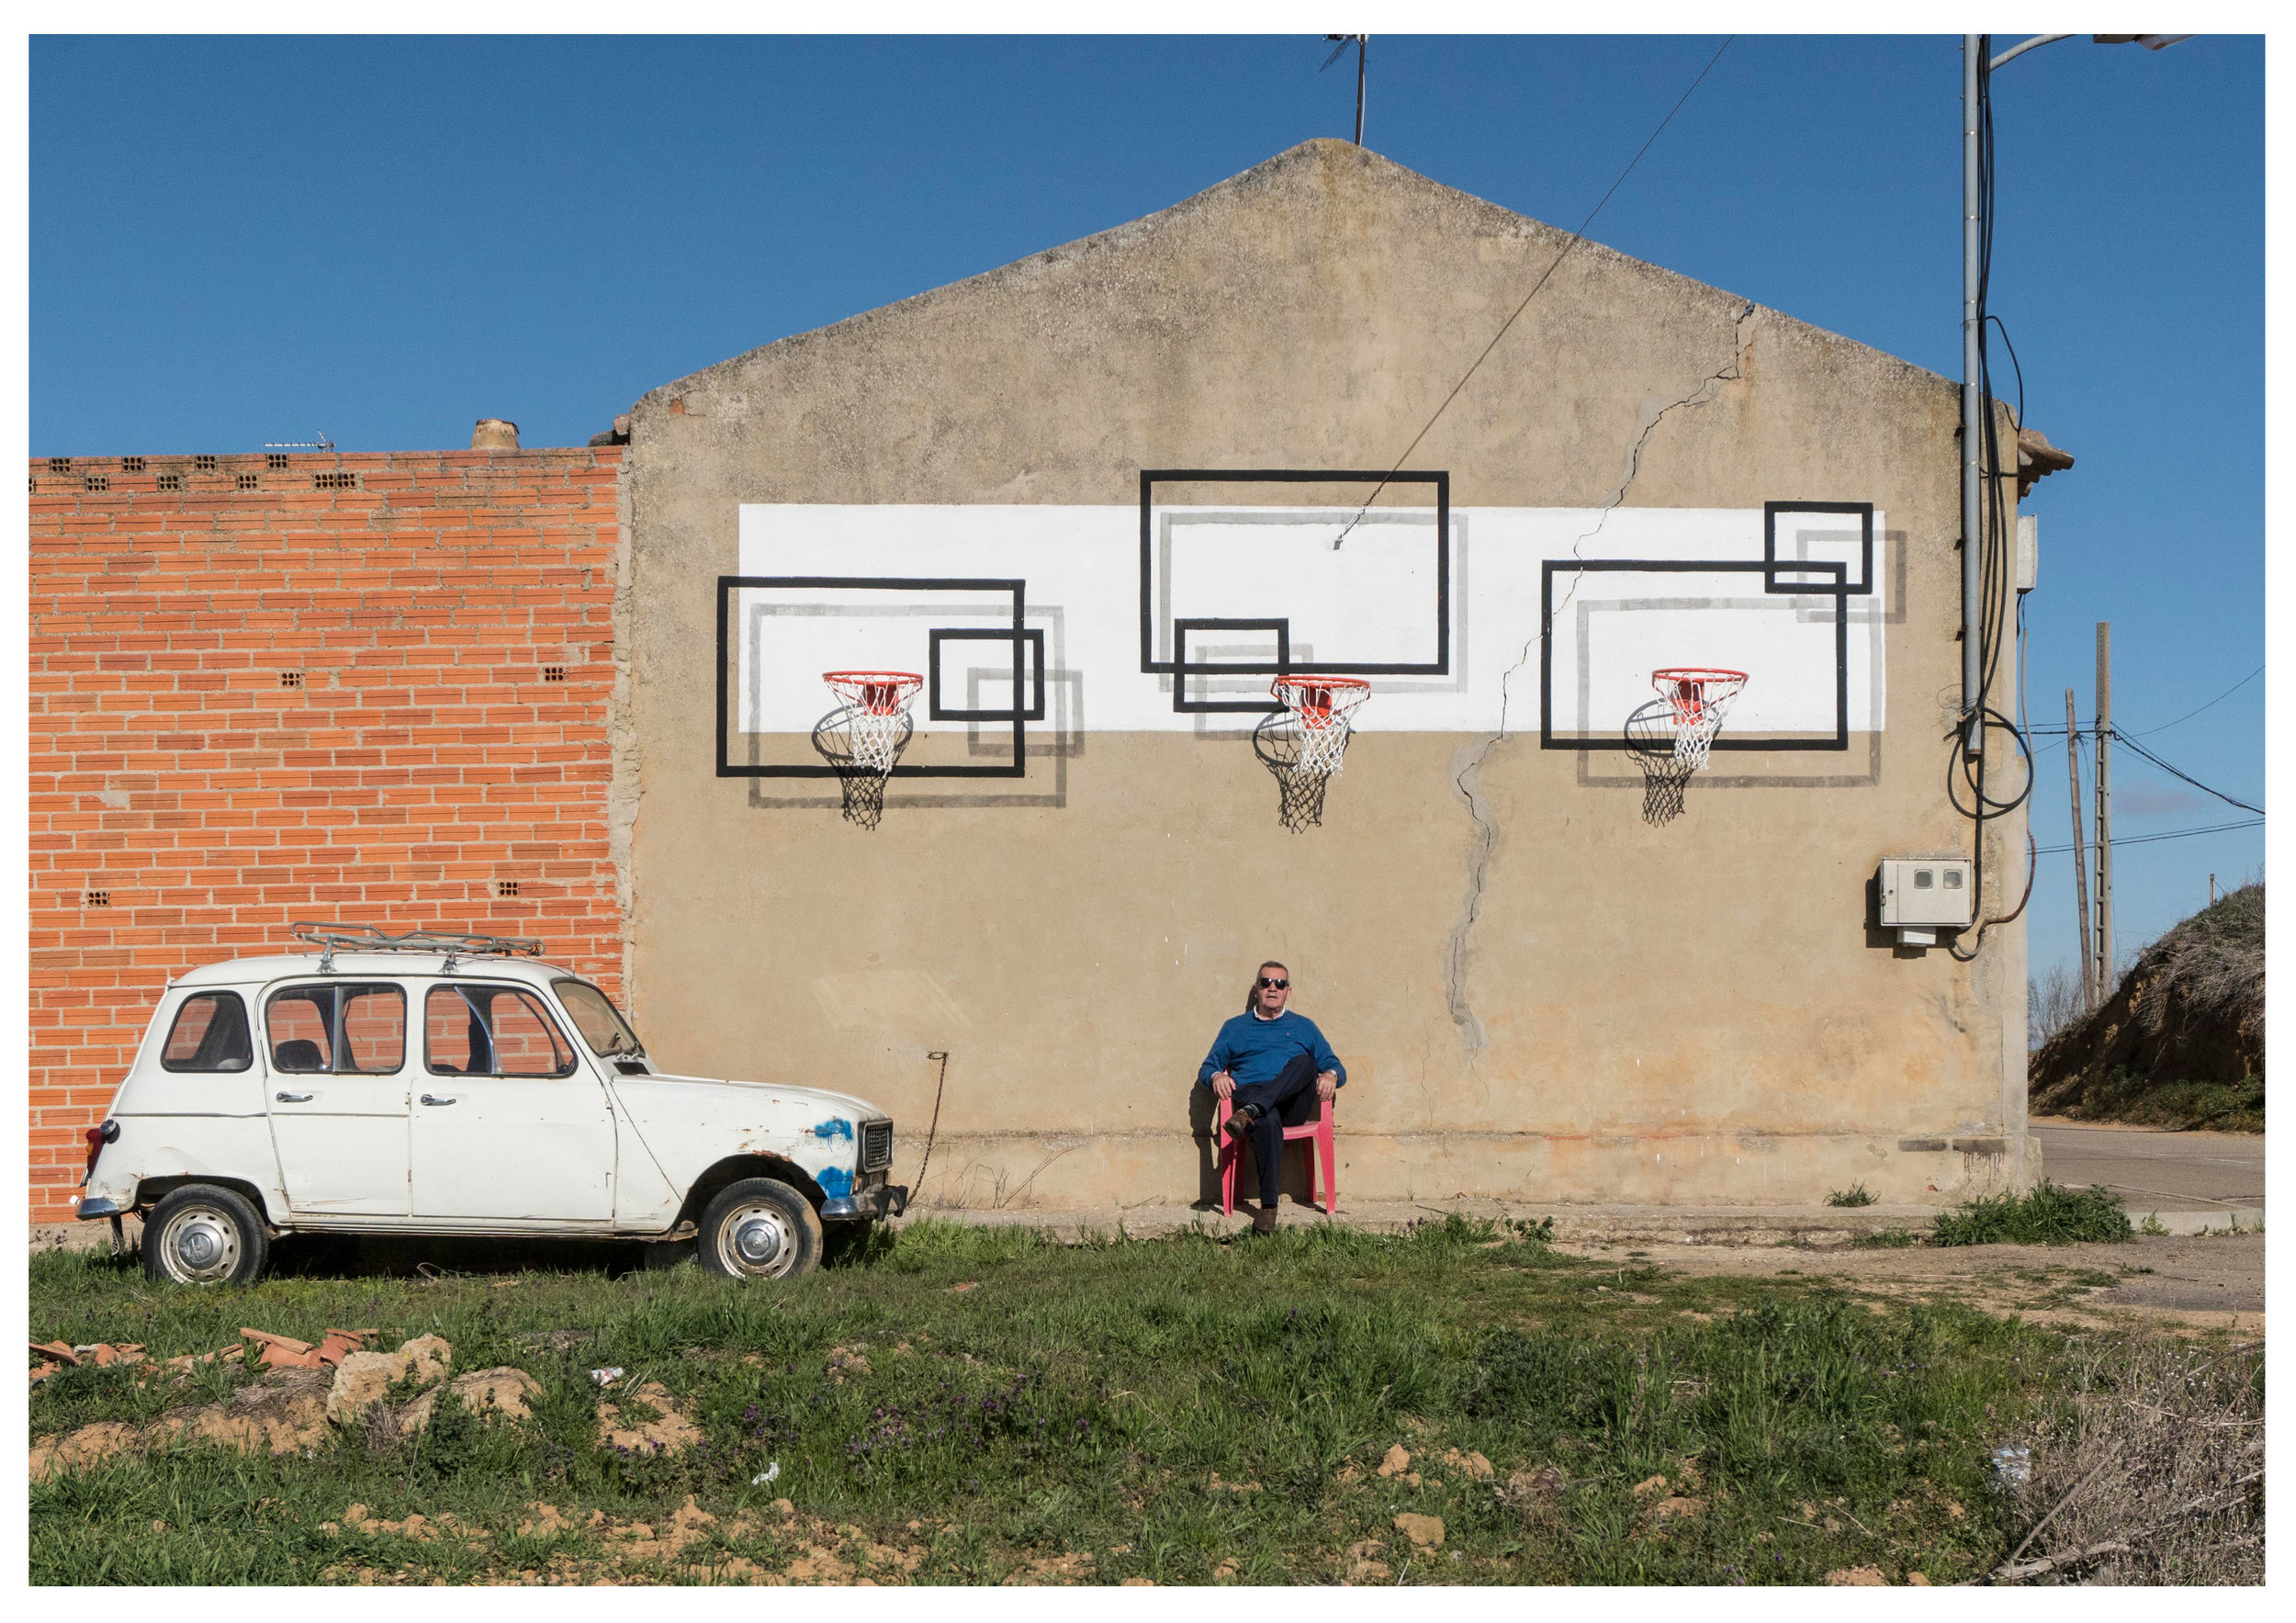 Reimagining basketball backboards.